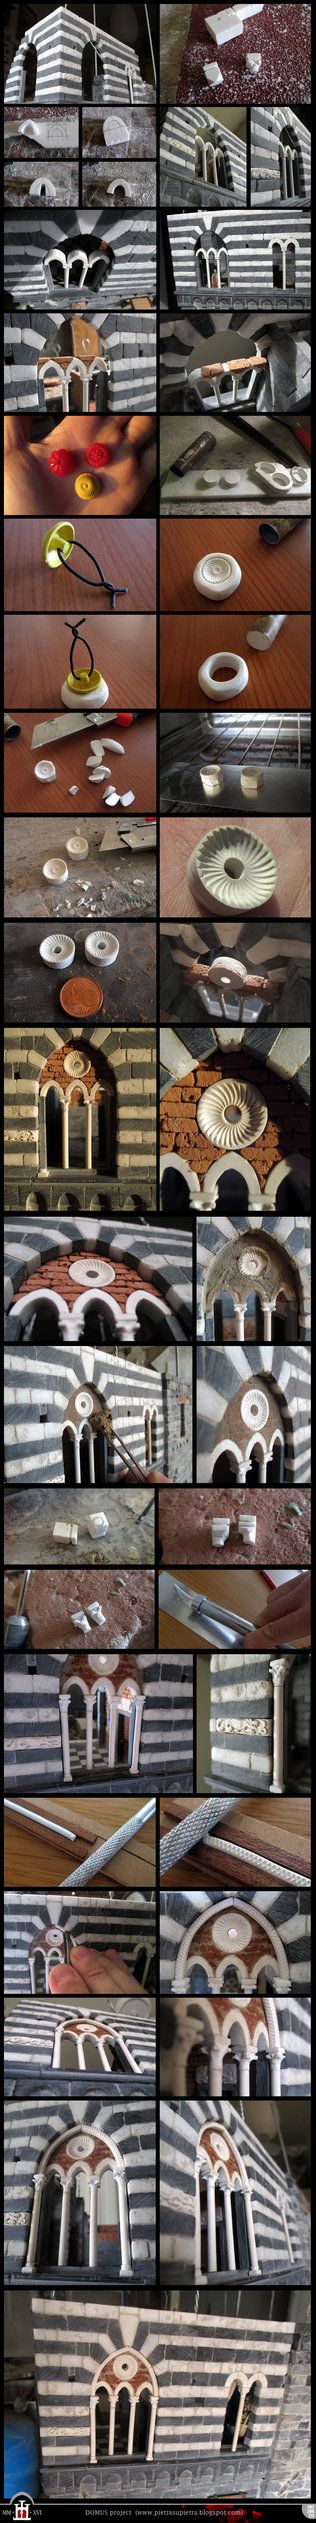 Domus project 202-209-211: Three mullioned window